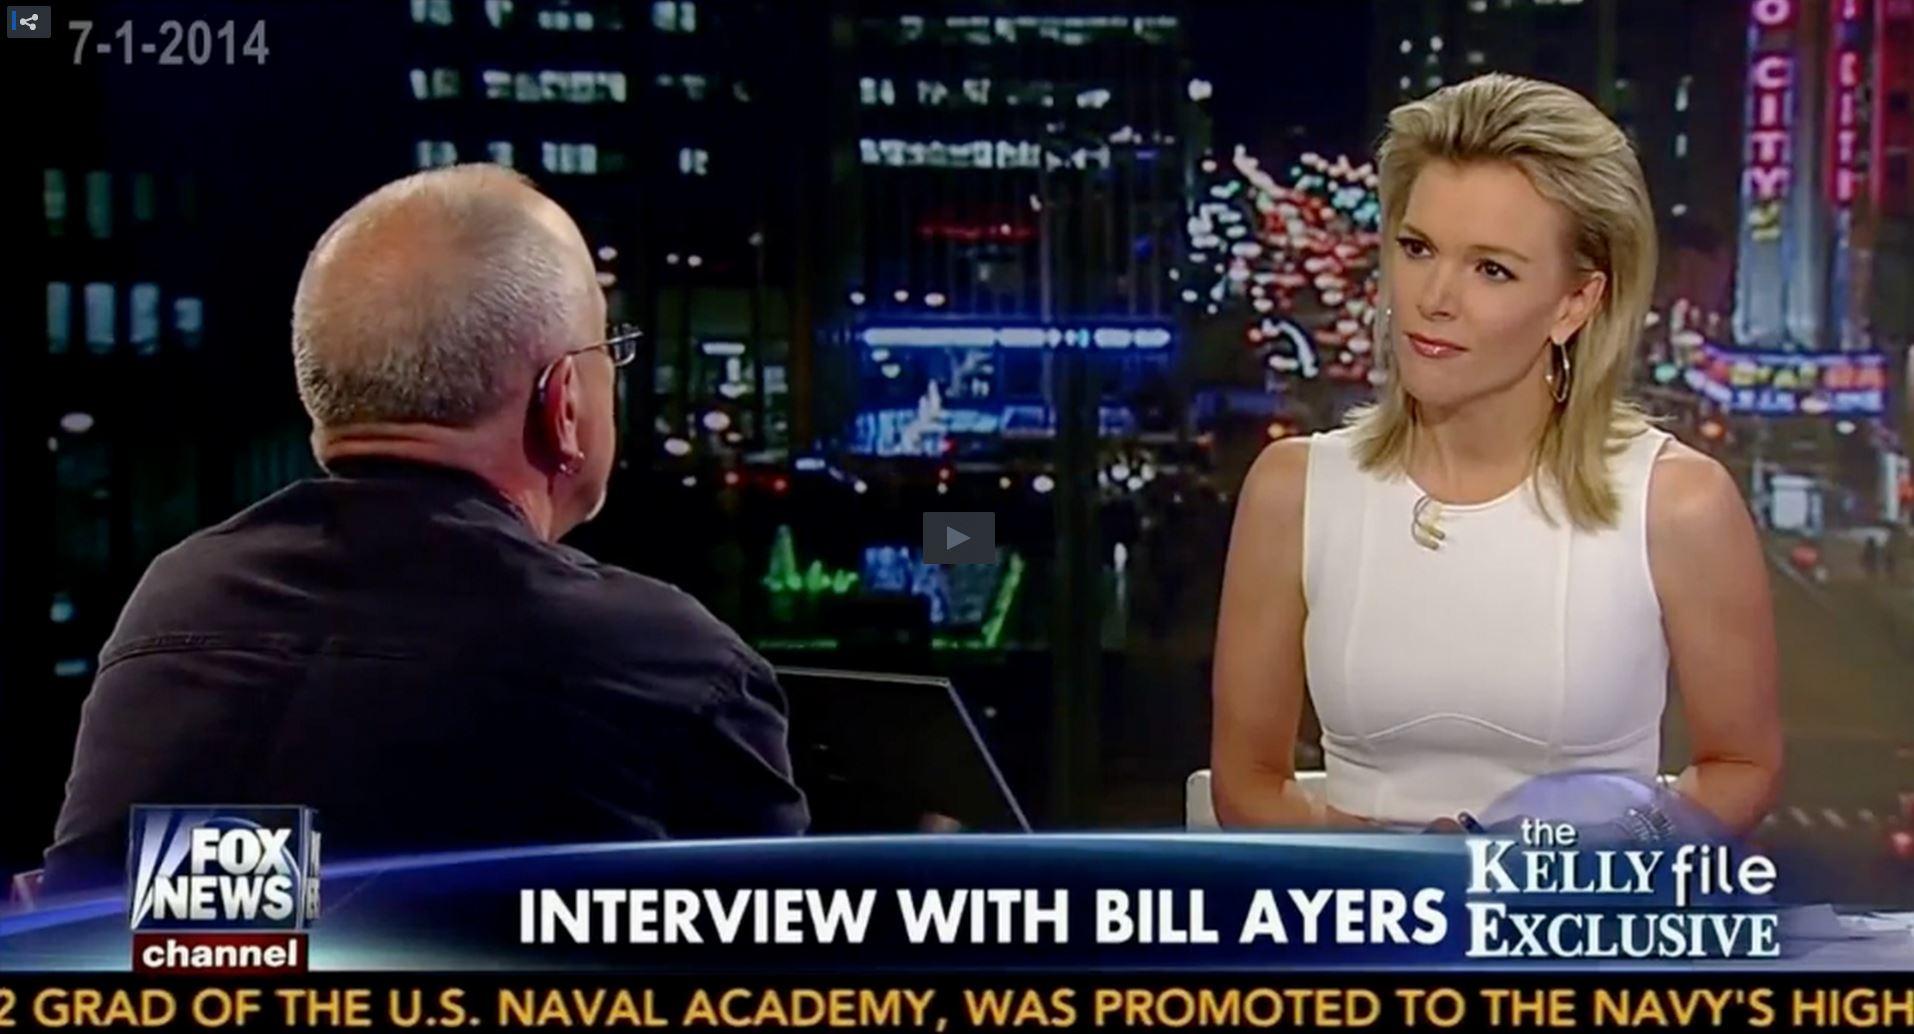 Megyn Kelly & Bill Ayers